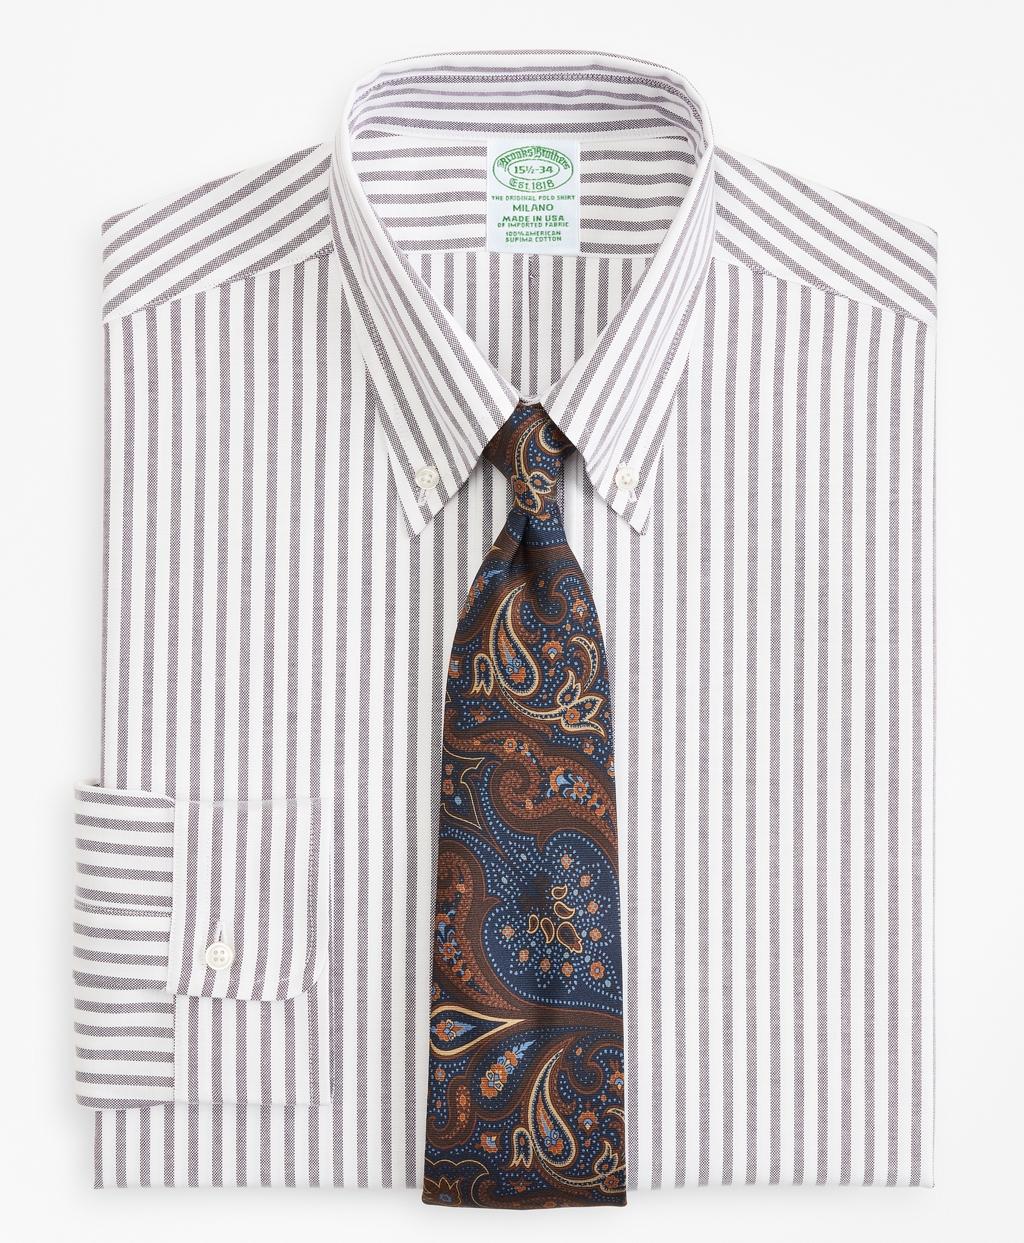 Edwardian Men's Shirts & Sweaters Brooks Brothers Mens Original Polo Button-Down Oxford Extra Slim Slim-Fit Dress Shirt Stripe $140.00 AT vintagedancer.com